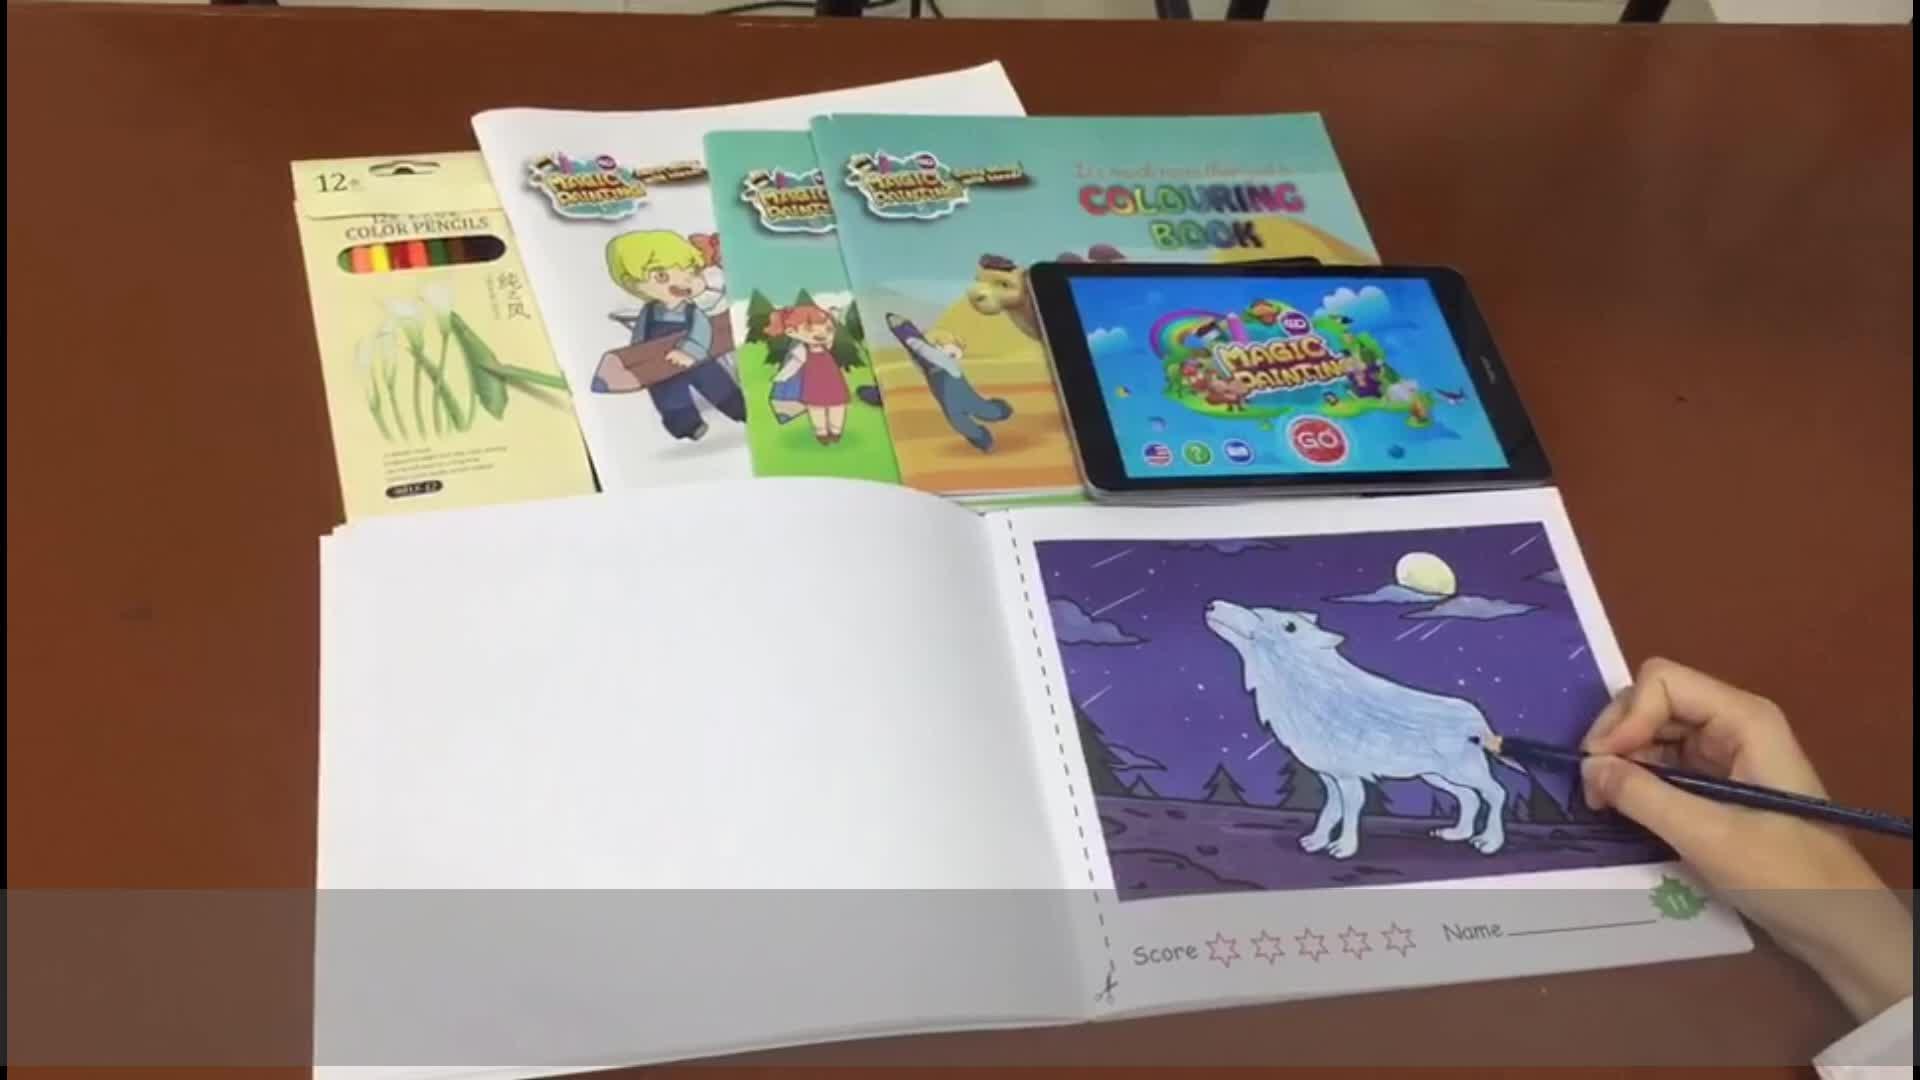 Produsen Profesional Ar Permainan Lukisan Seni Kit untuk Anak-anak